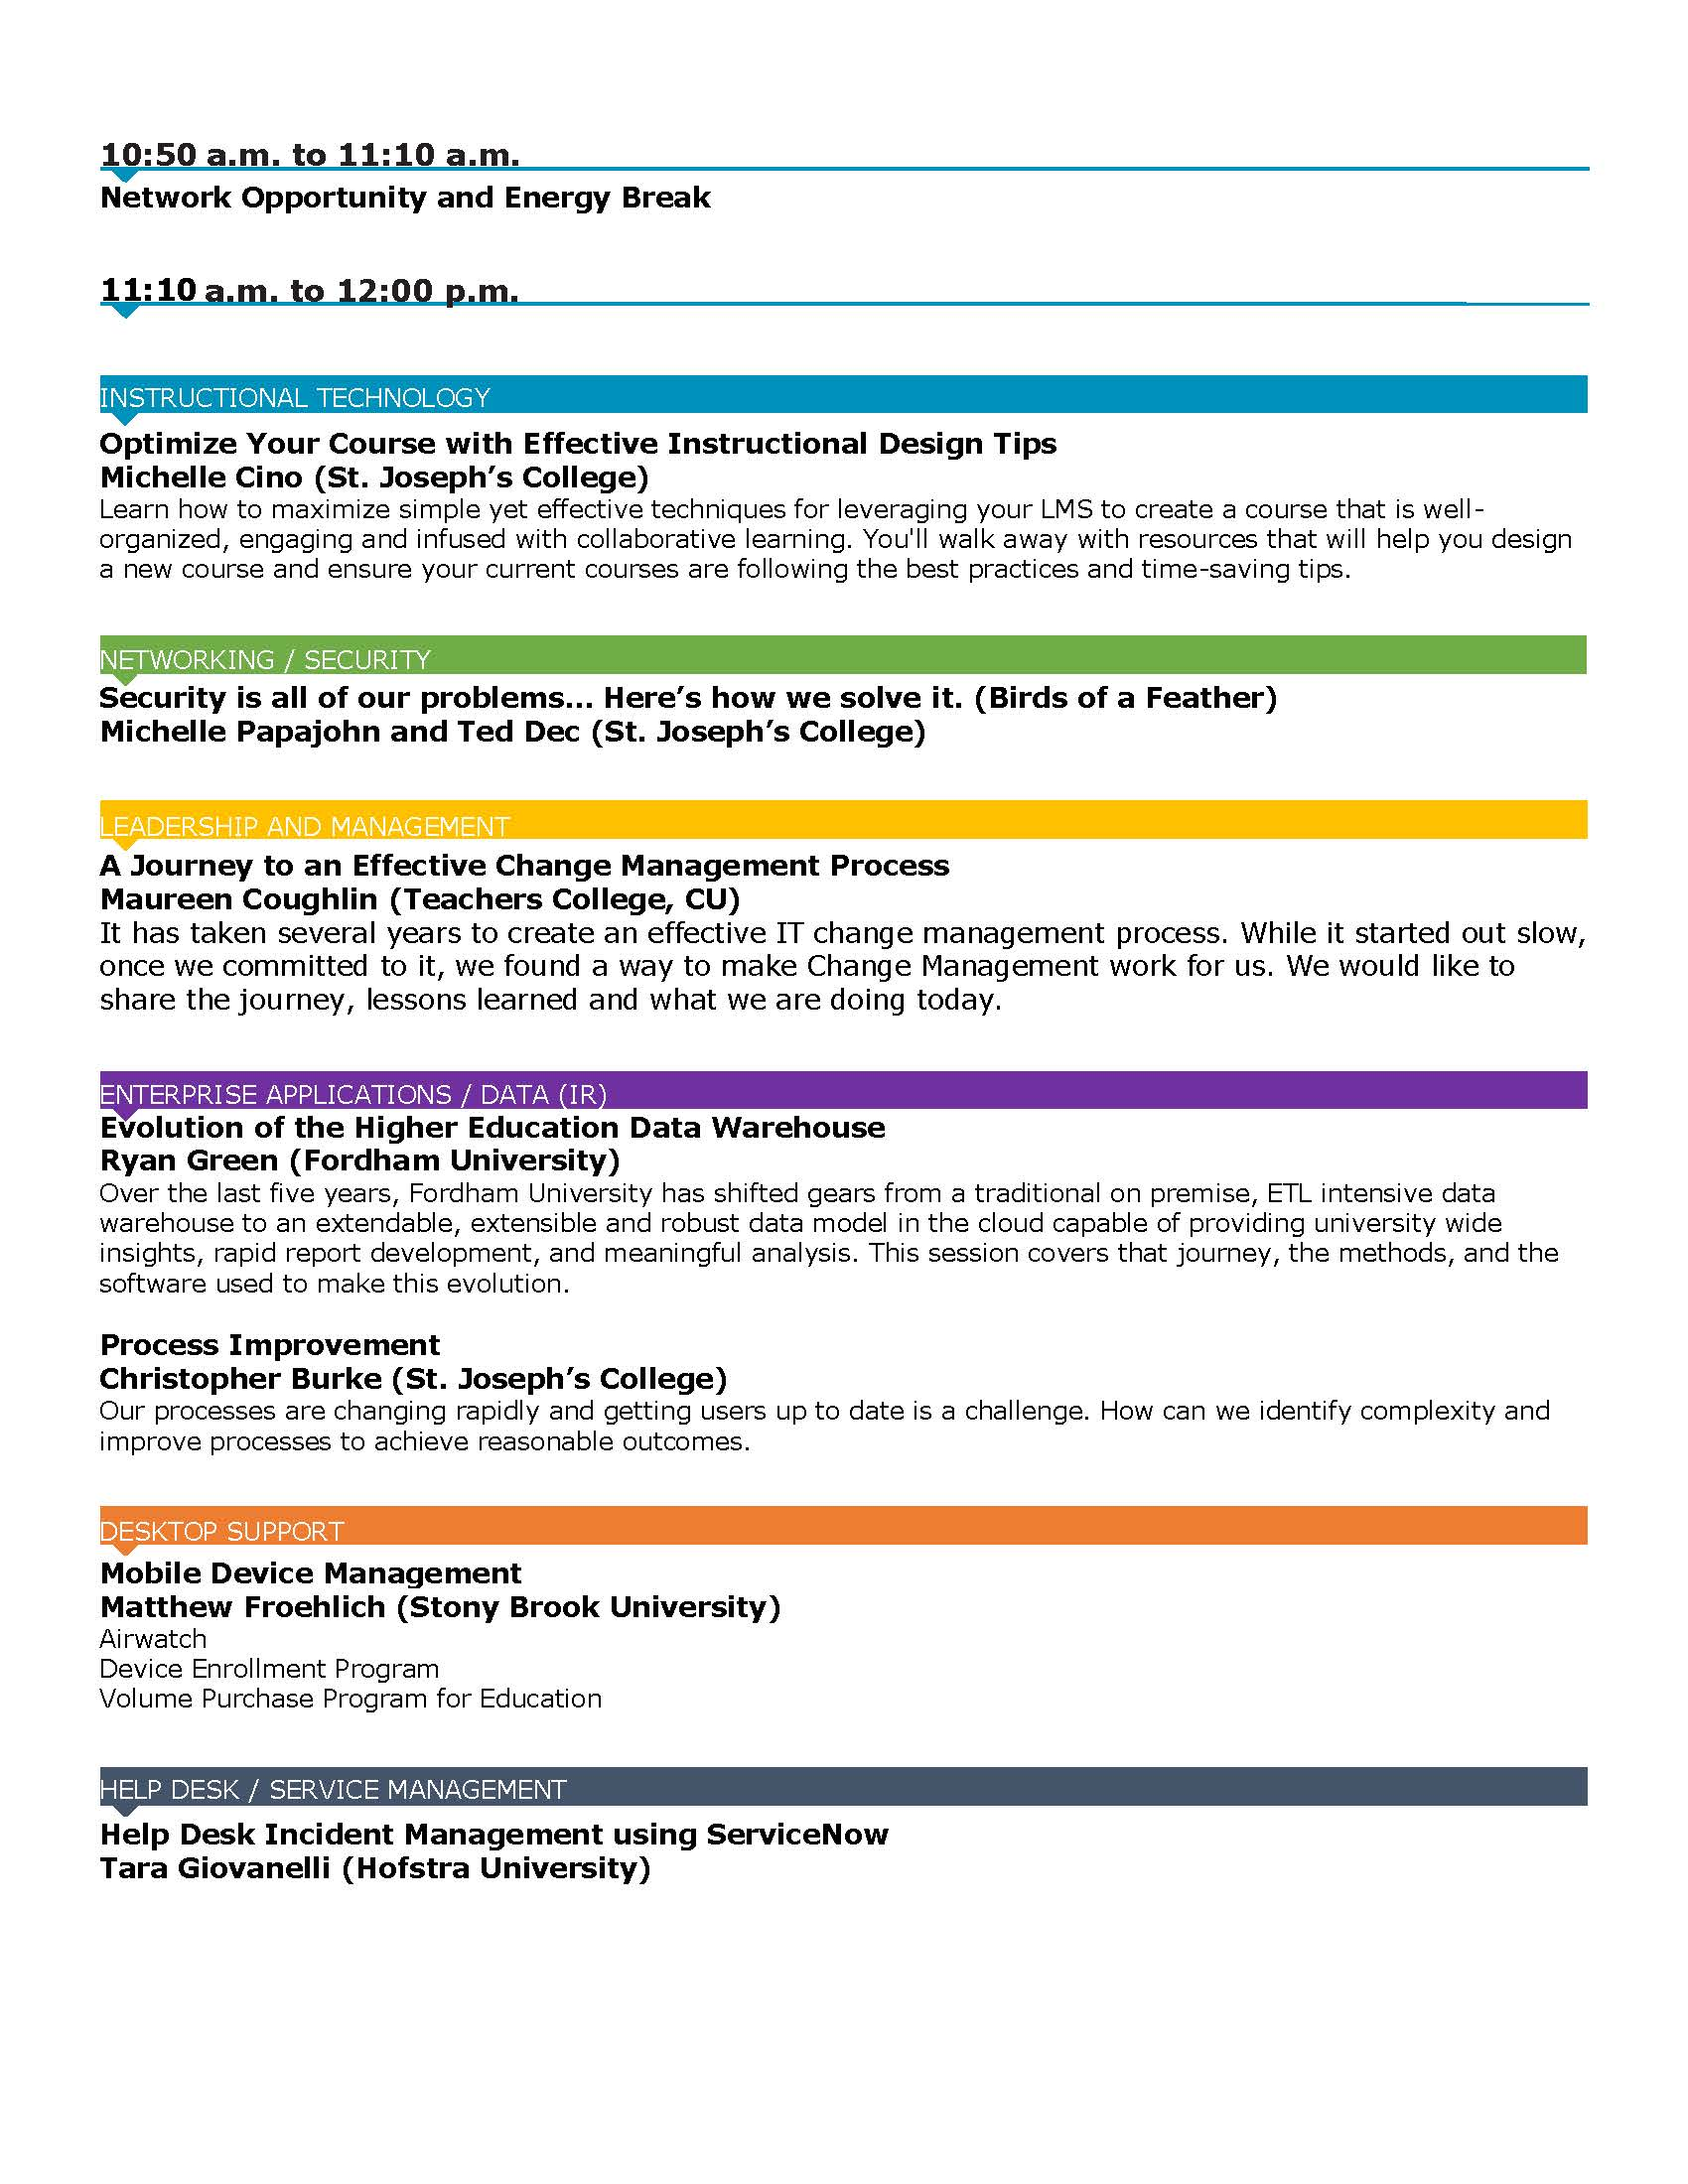 NYHETF 2019 SJC Agenda as of 5-21-19 Page 2.jpg